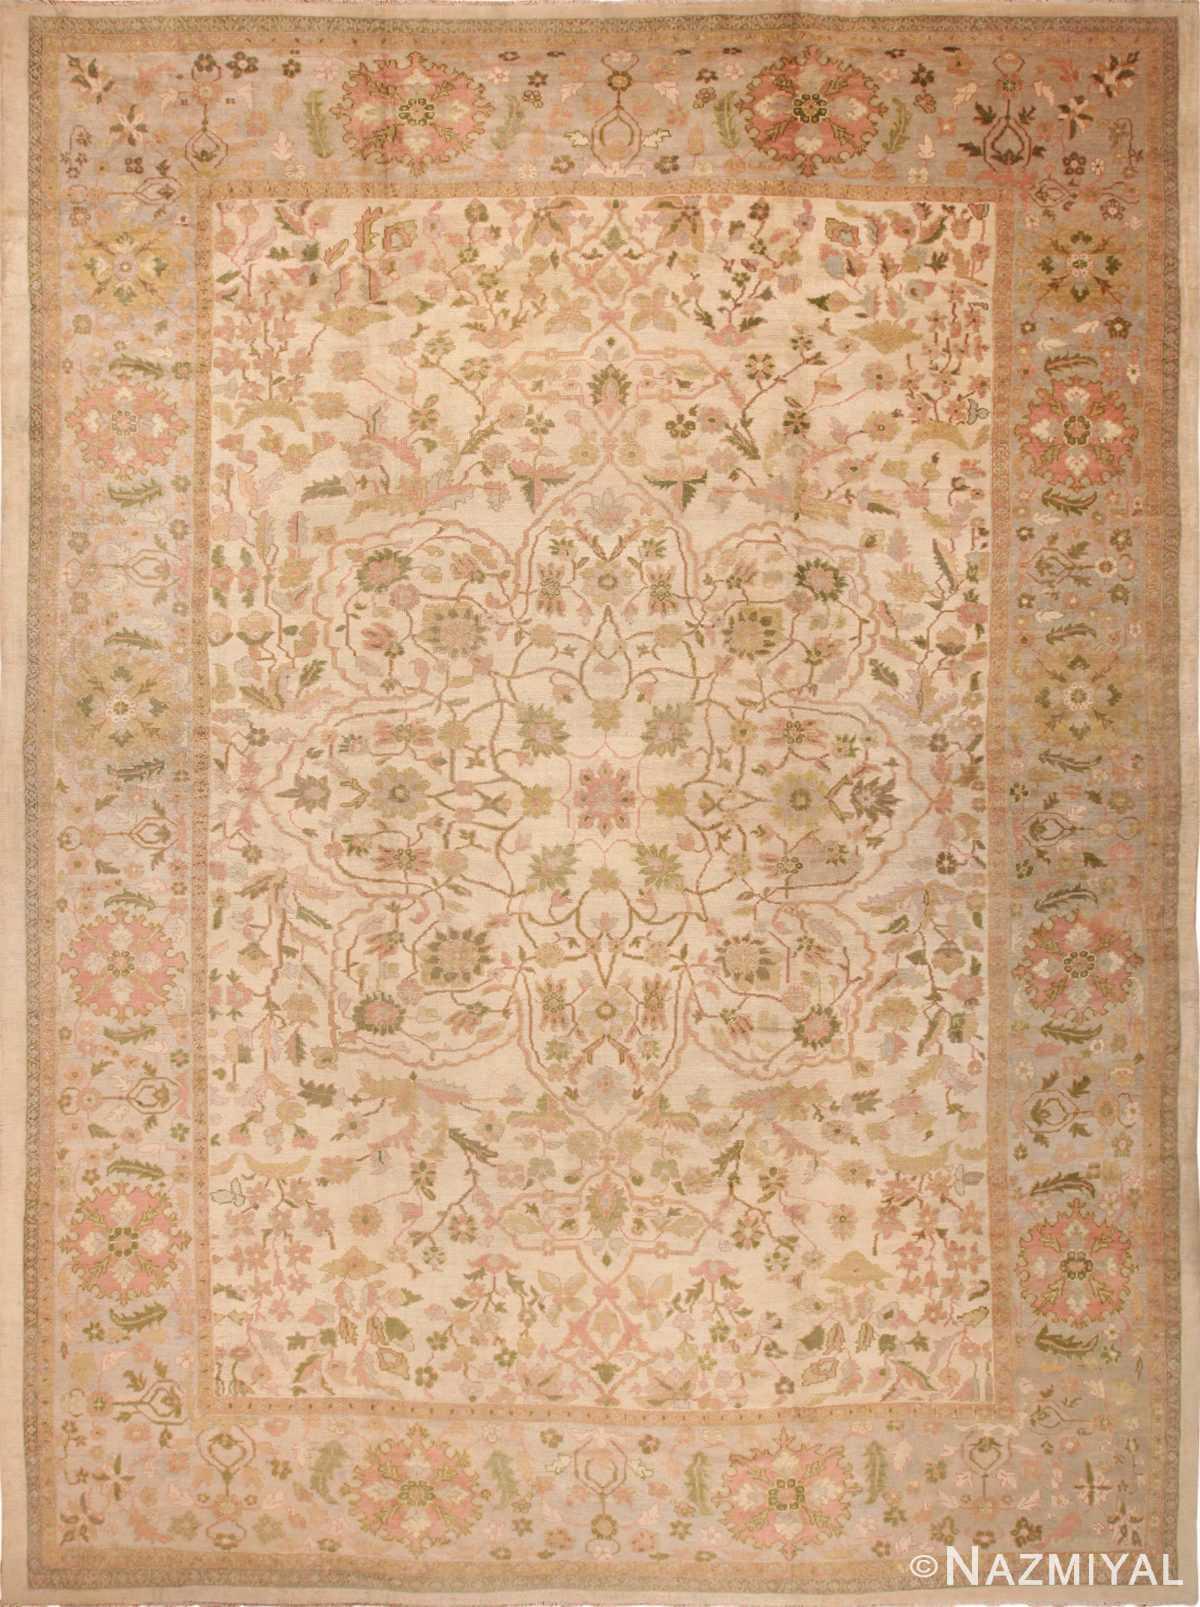 Antique Persian Sultanabad Rug 70013 by Nazmiyal